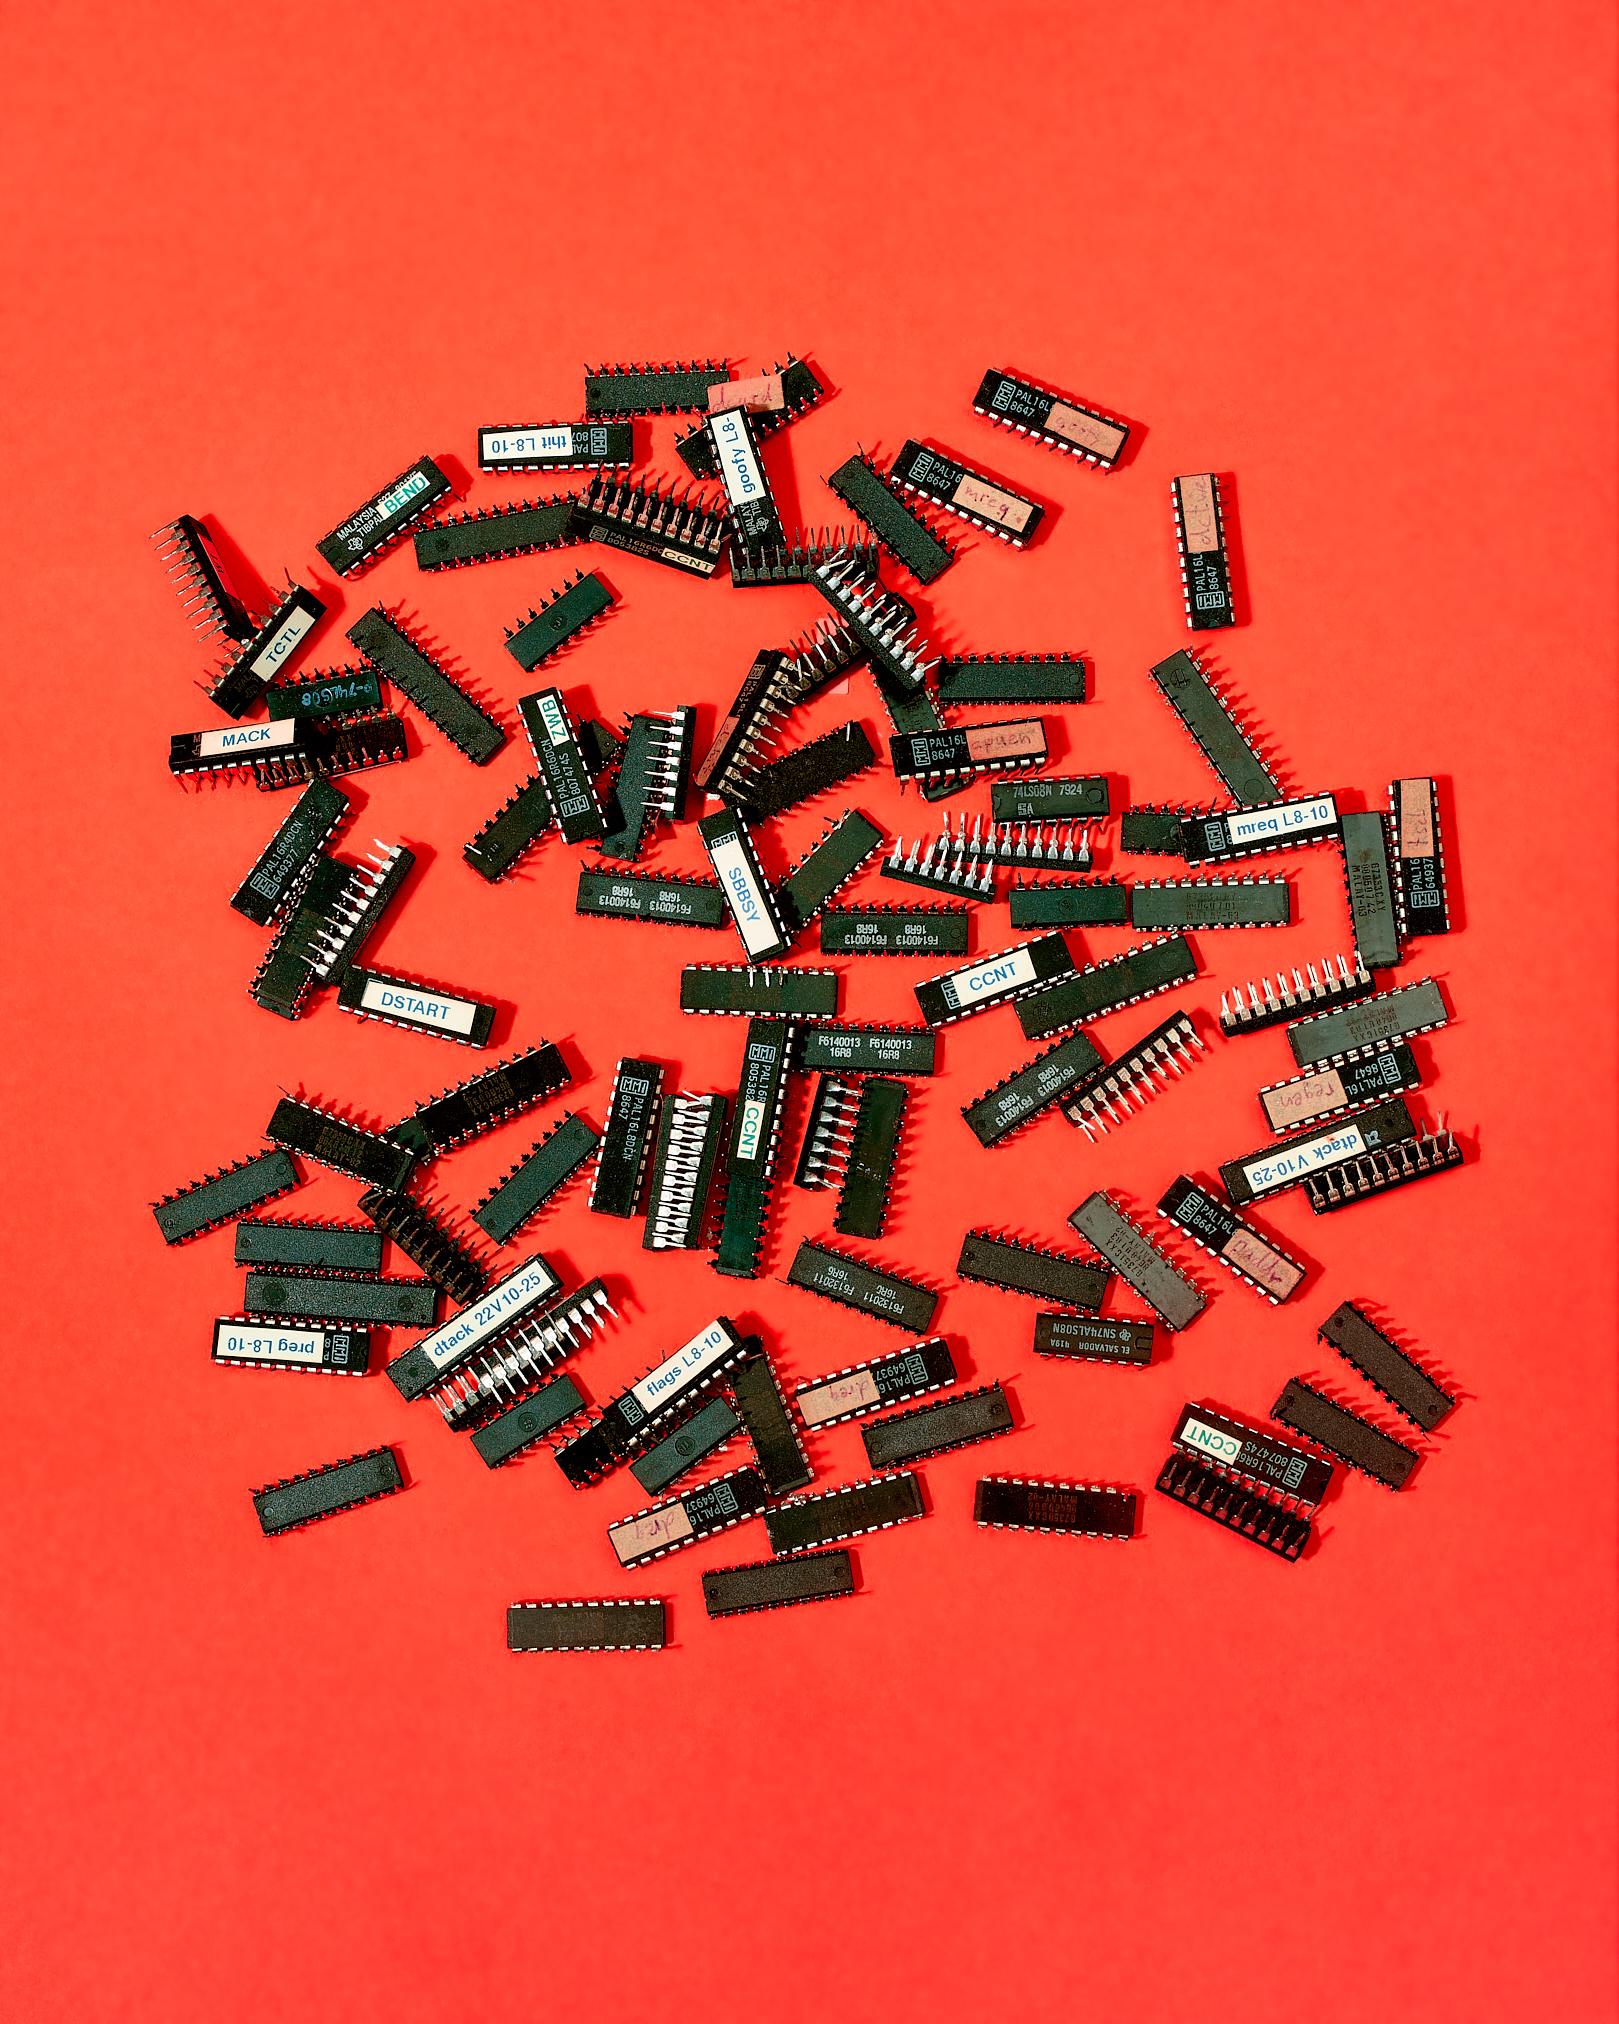 Programmable array logic chips